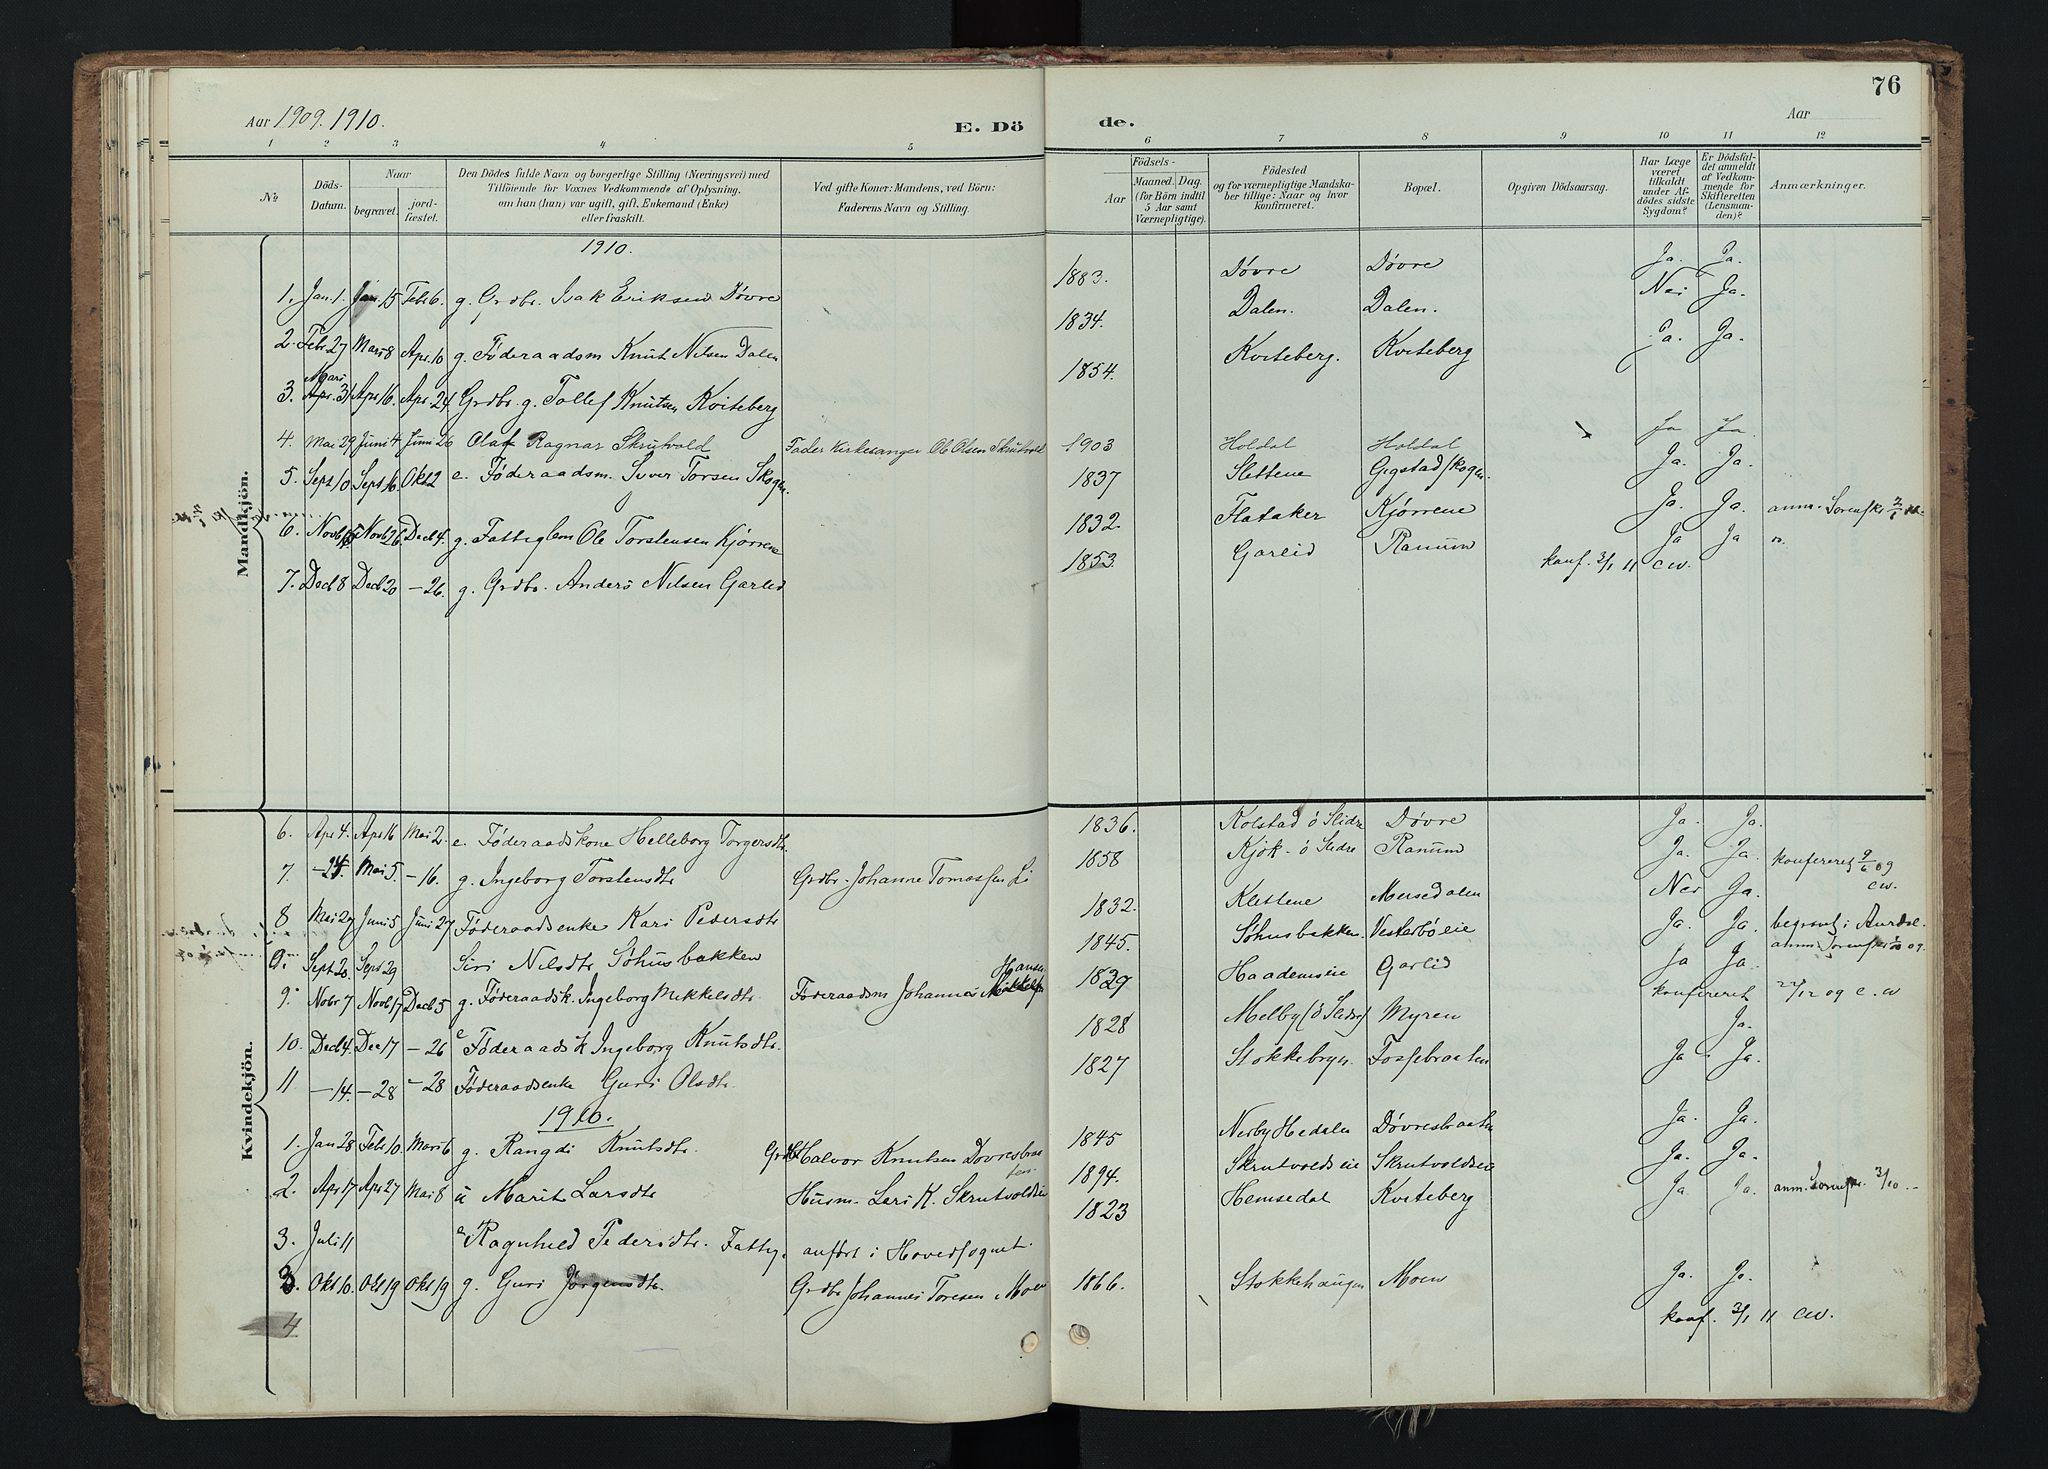 SAH, Nord-Aurdal prestekontor, Ministerialbok nr. 15, 1896-1914, s. 76